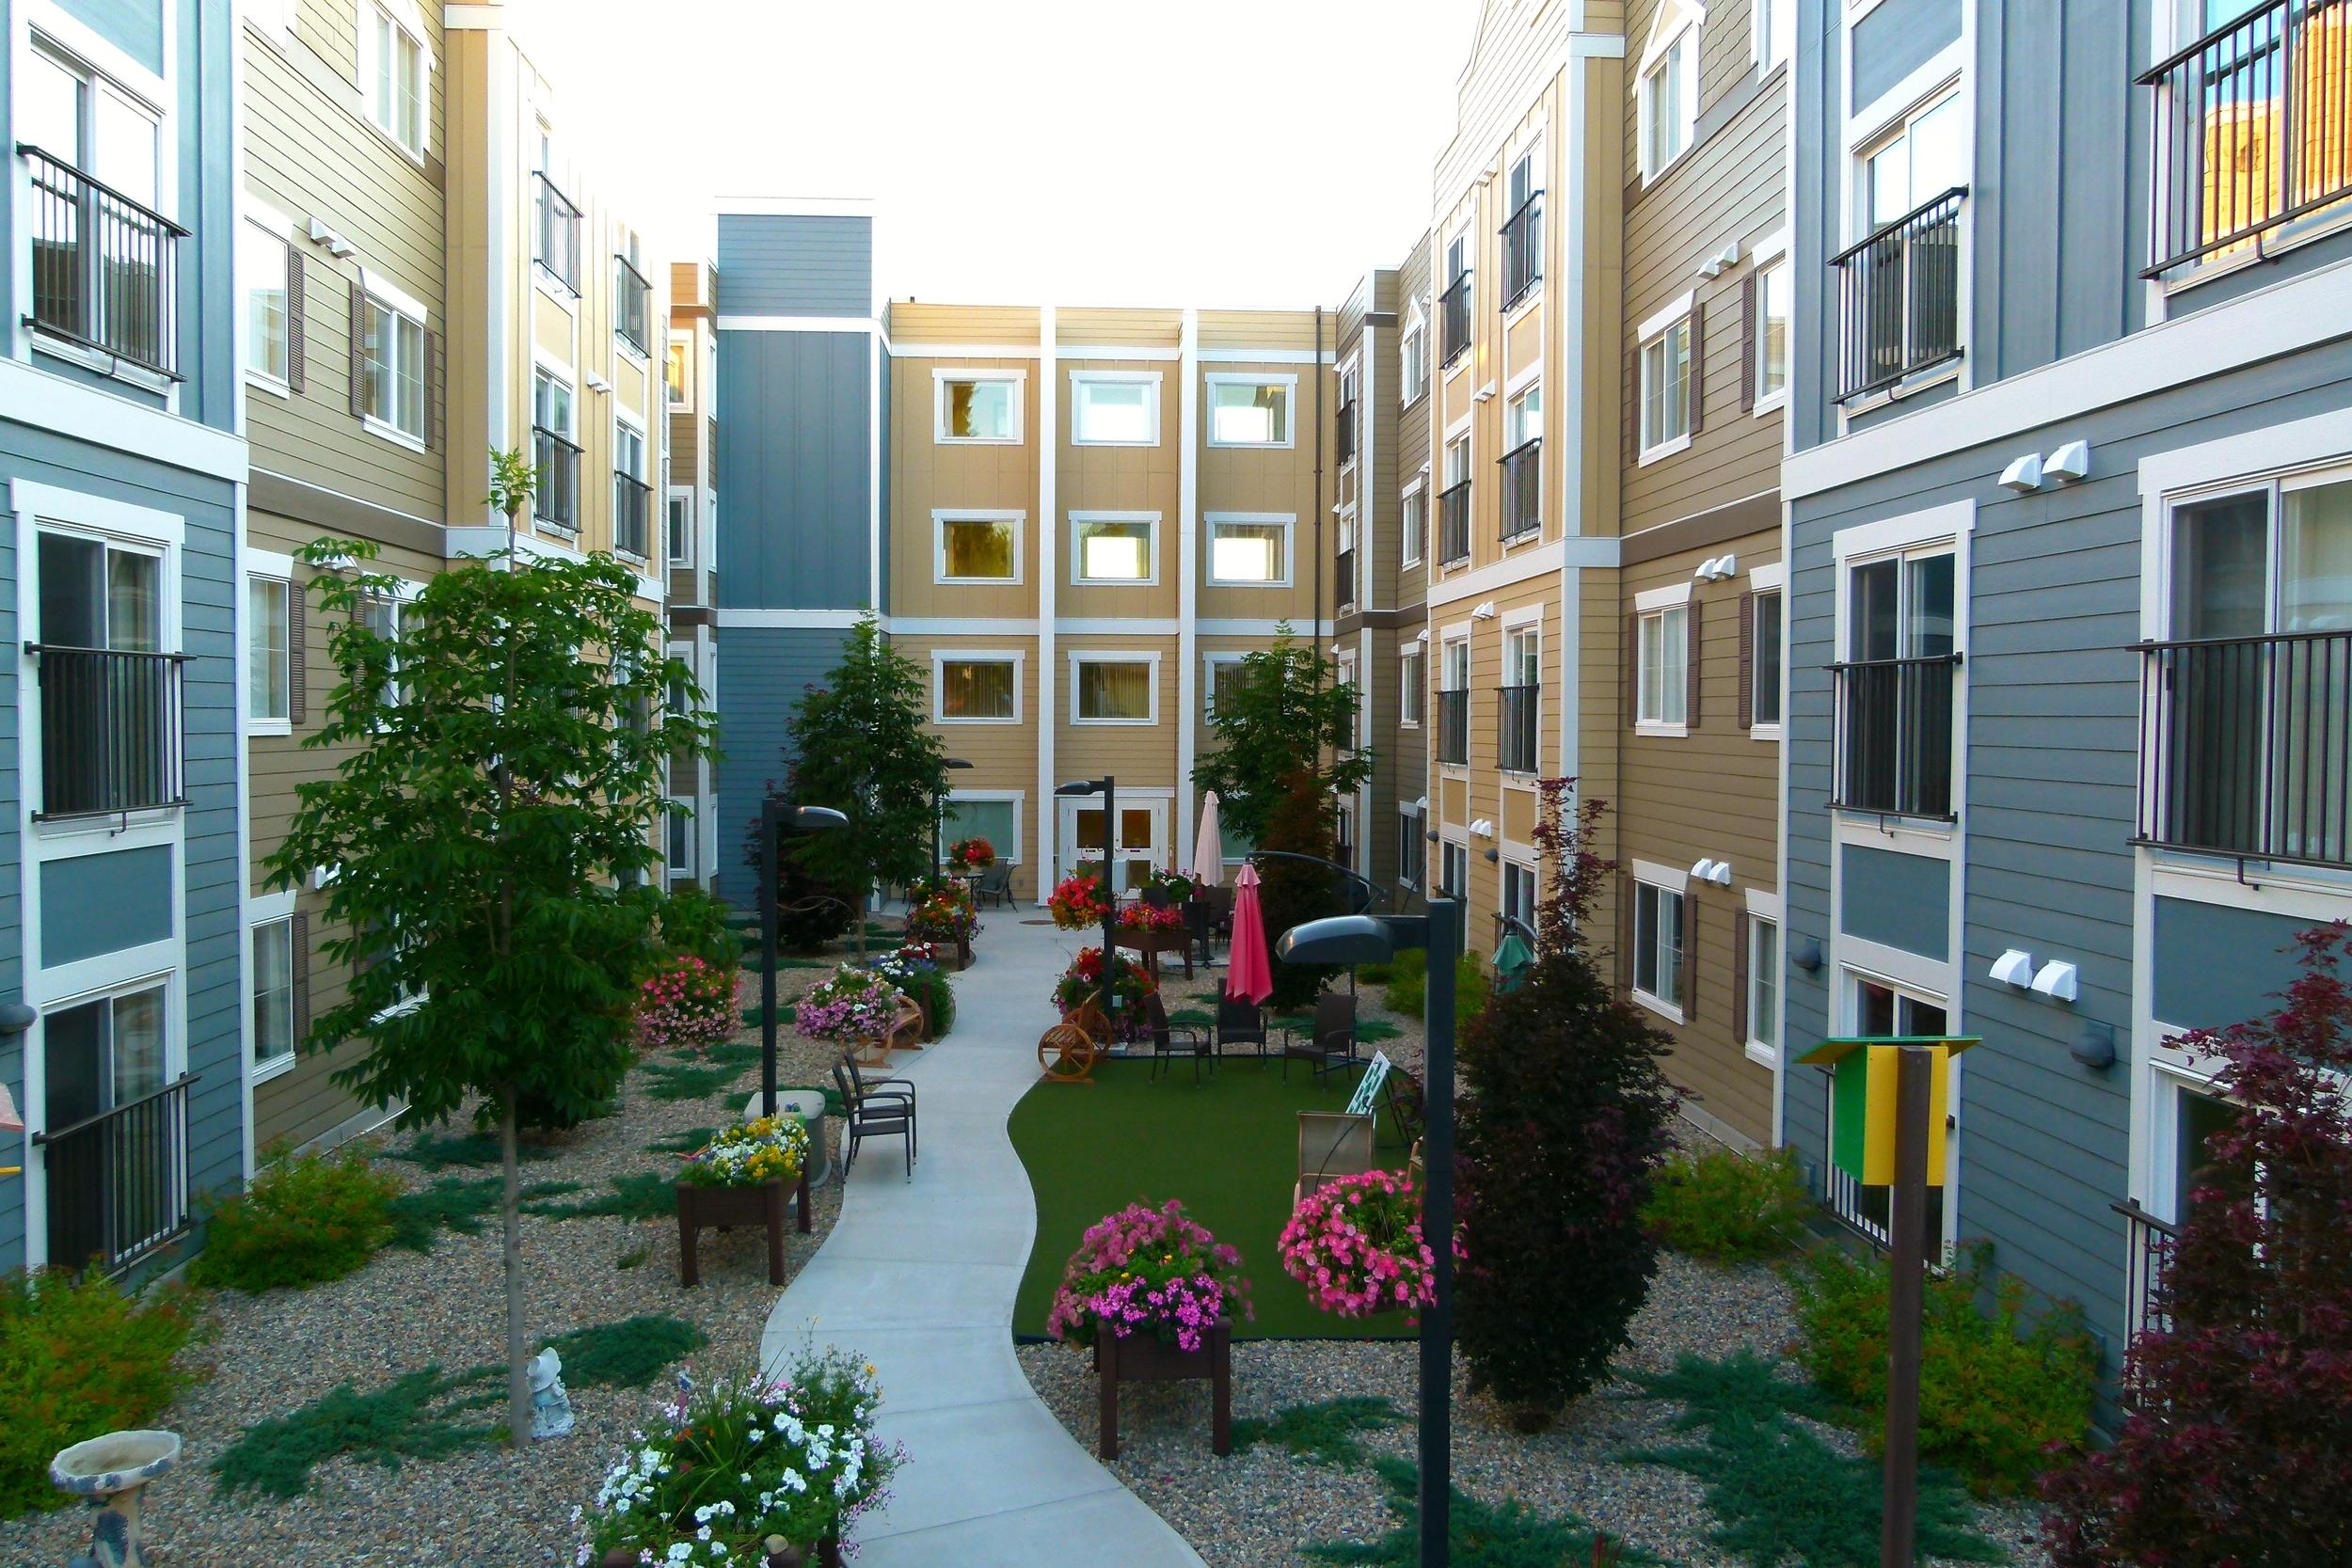 Courtyard 1_big view.JPG